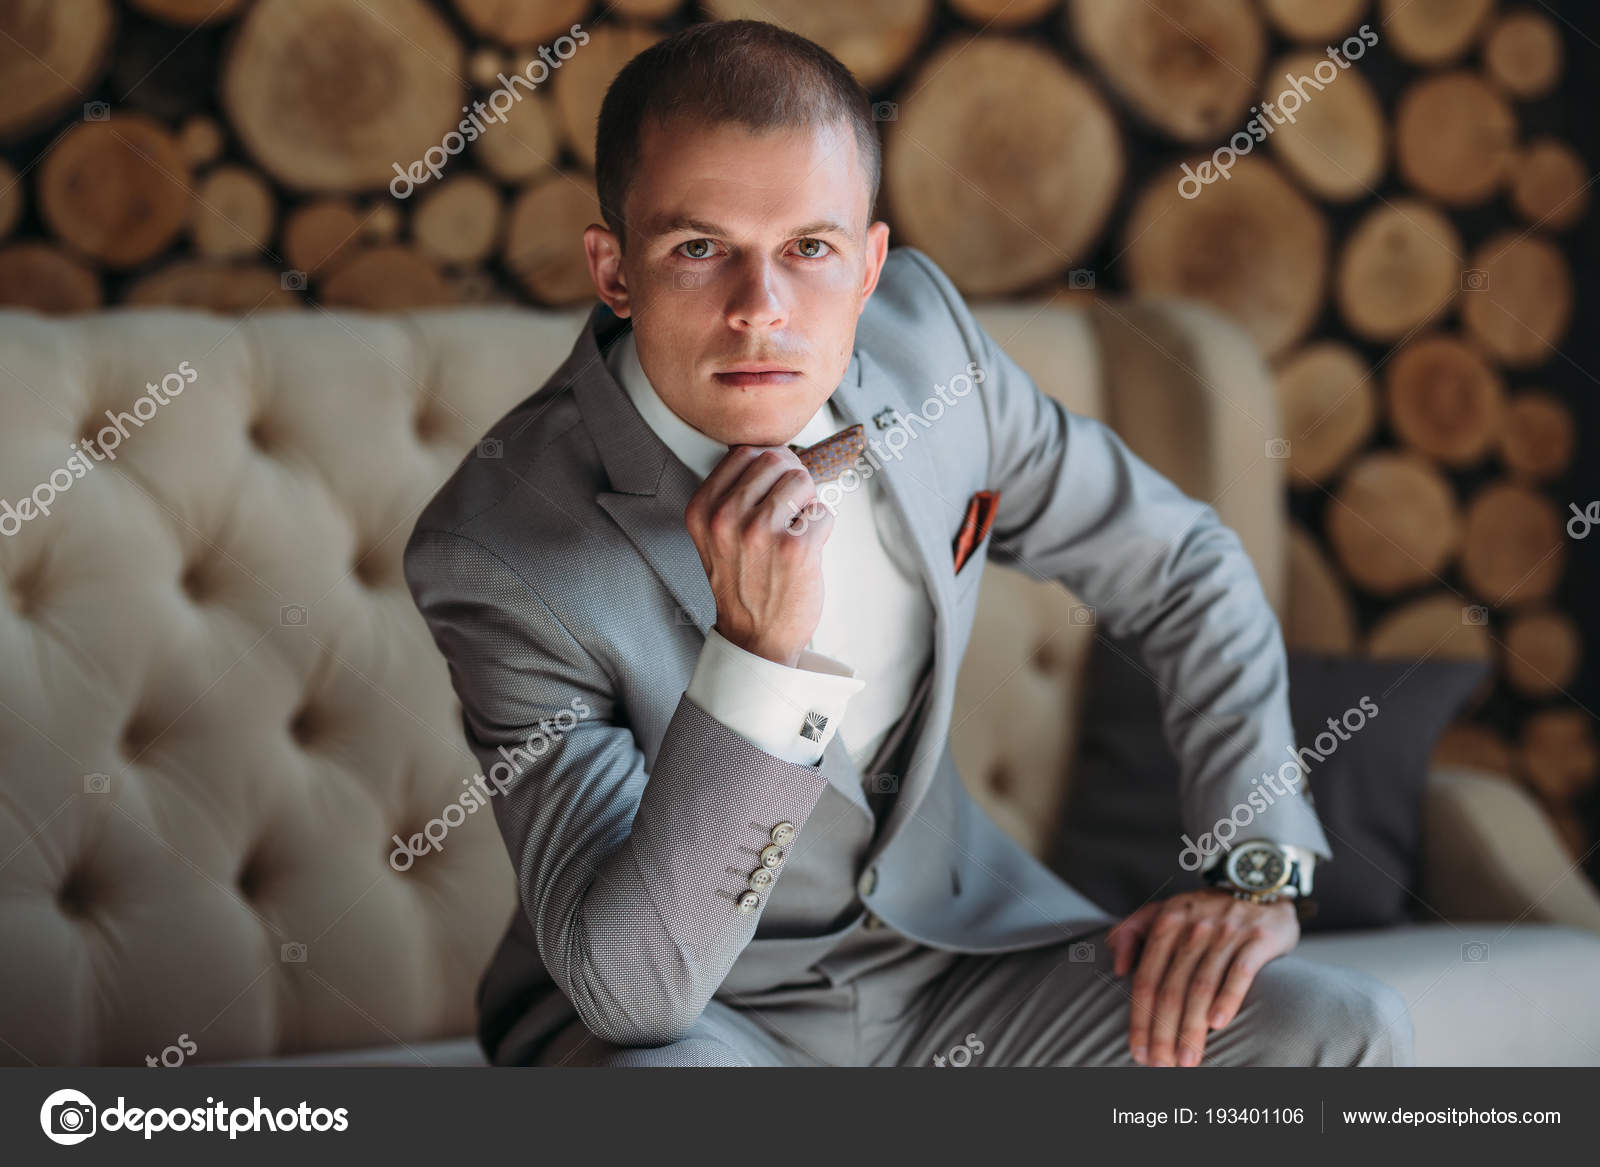 d703b74725e0 Ένας άντρας σε επαγγελματικά ρούχα με αξεσουάρ και μανικετόκουμπα ...